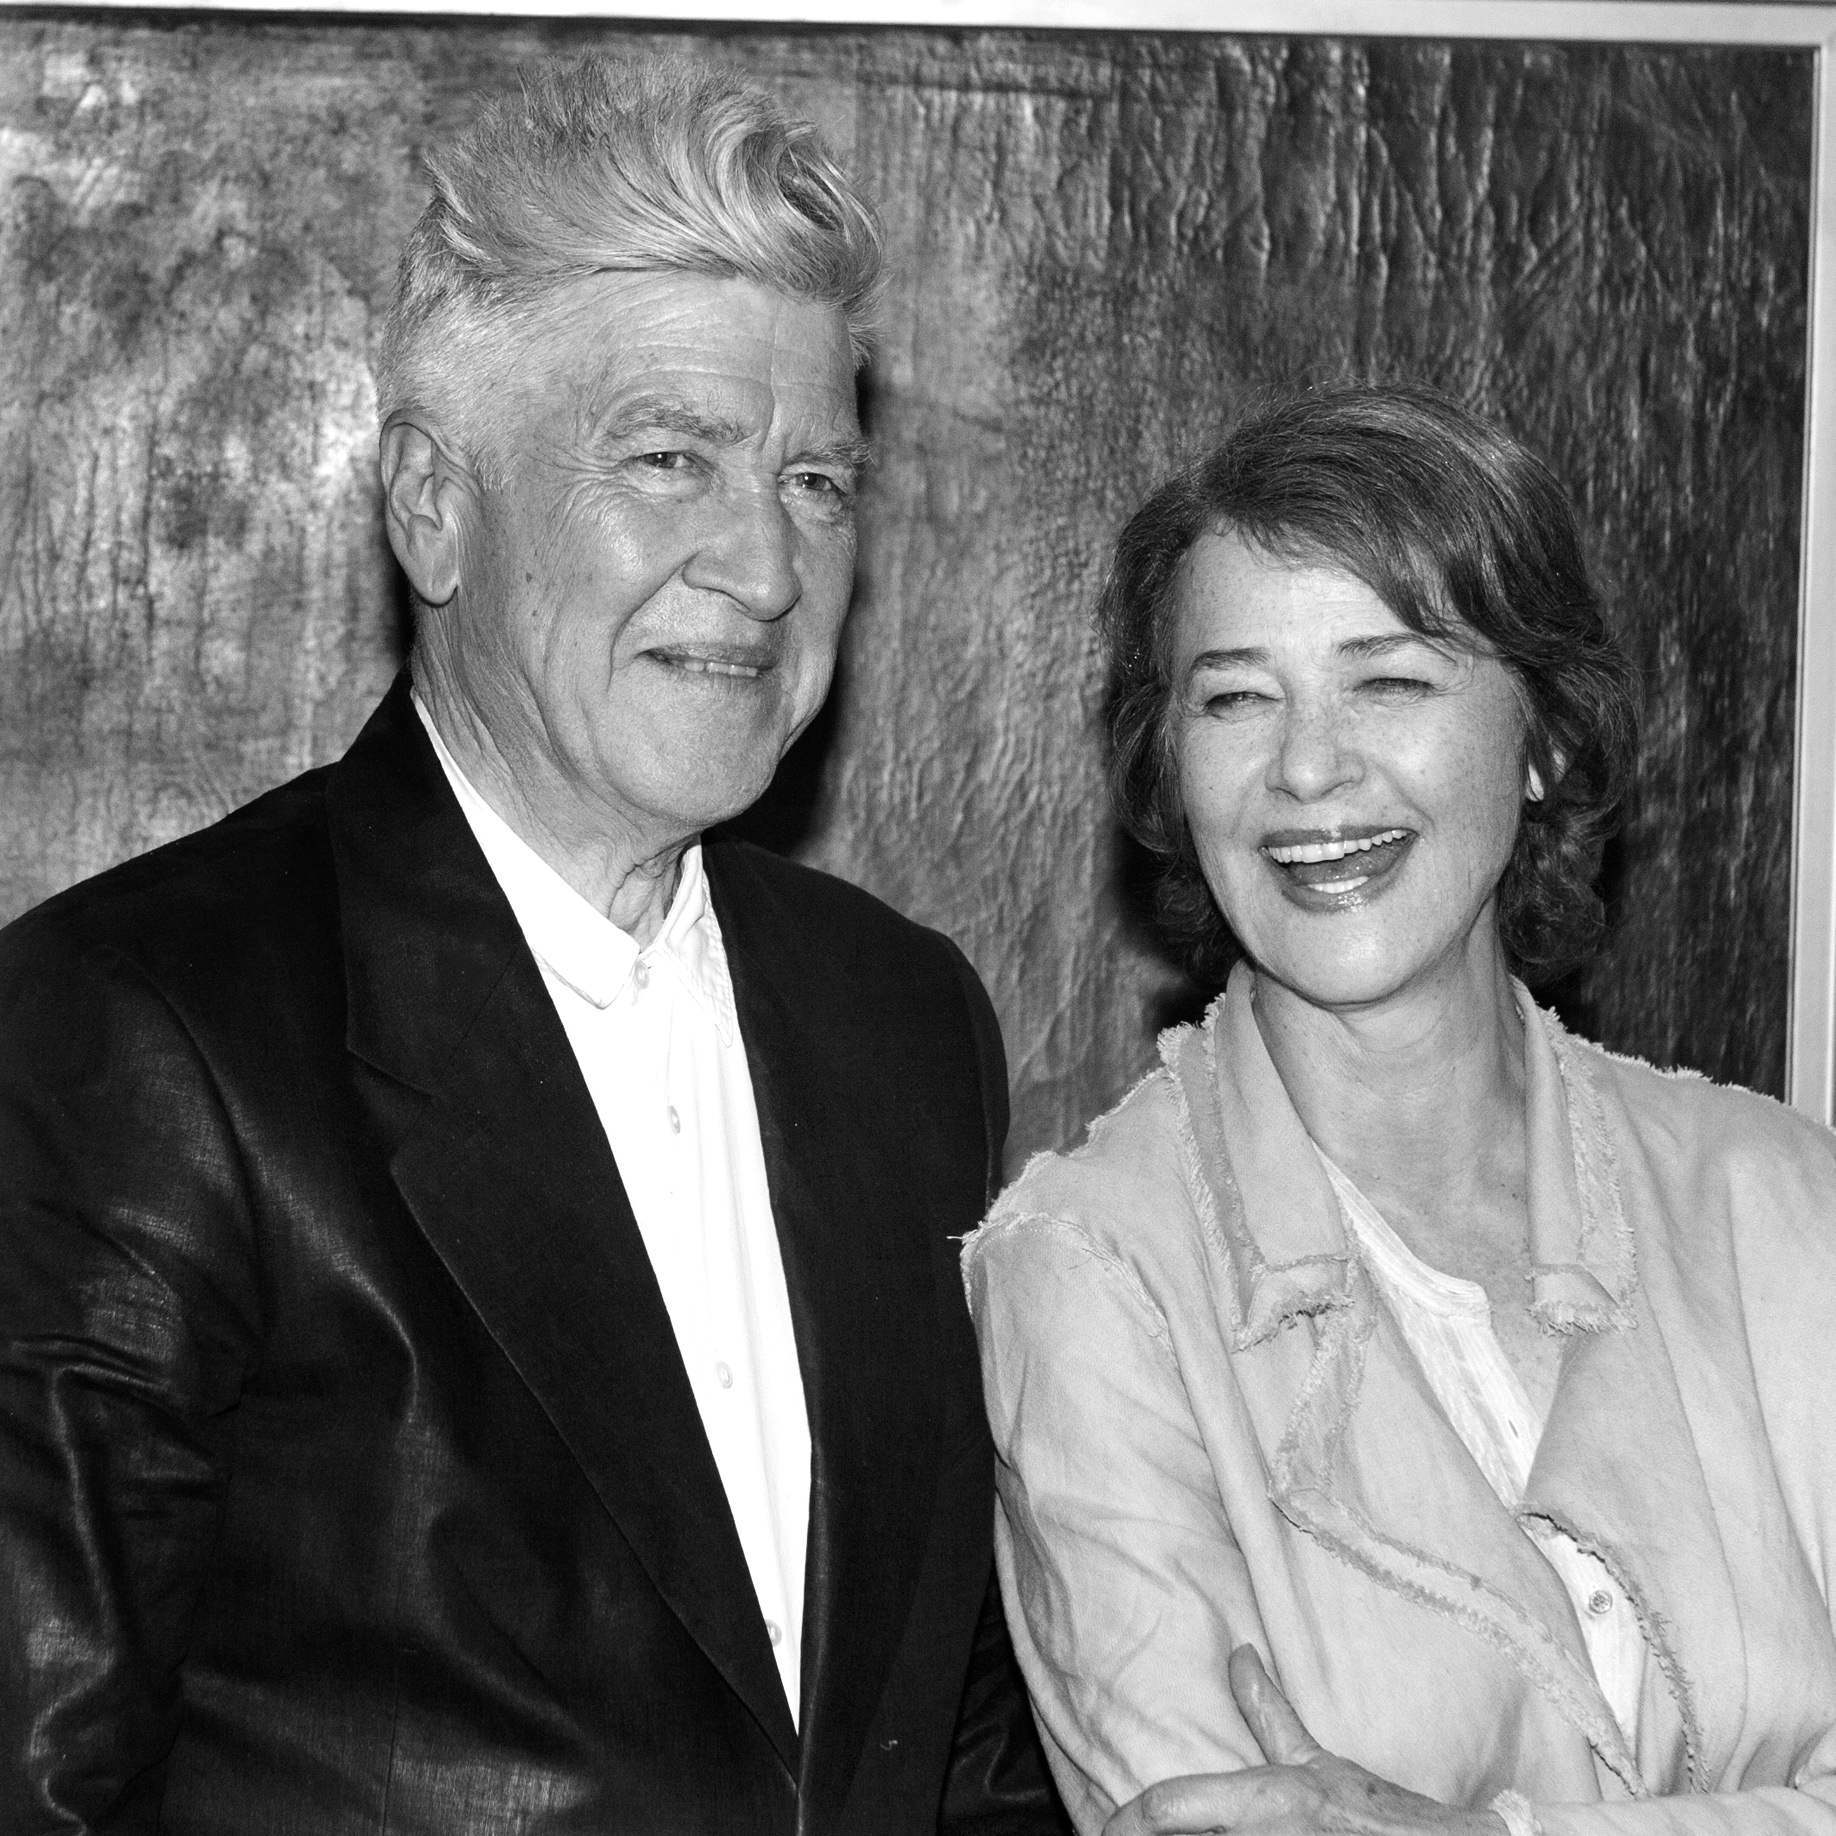 David Lynch & Charlotte Rampling